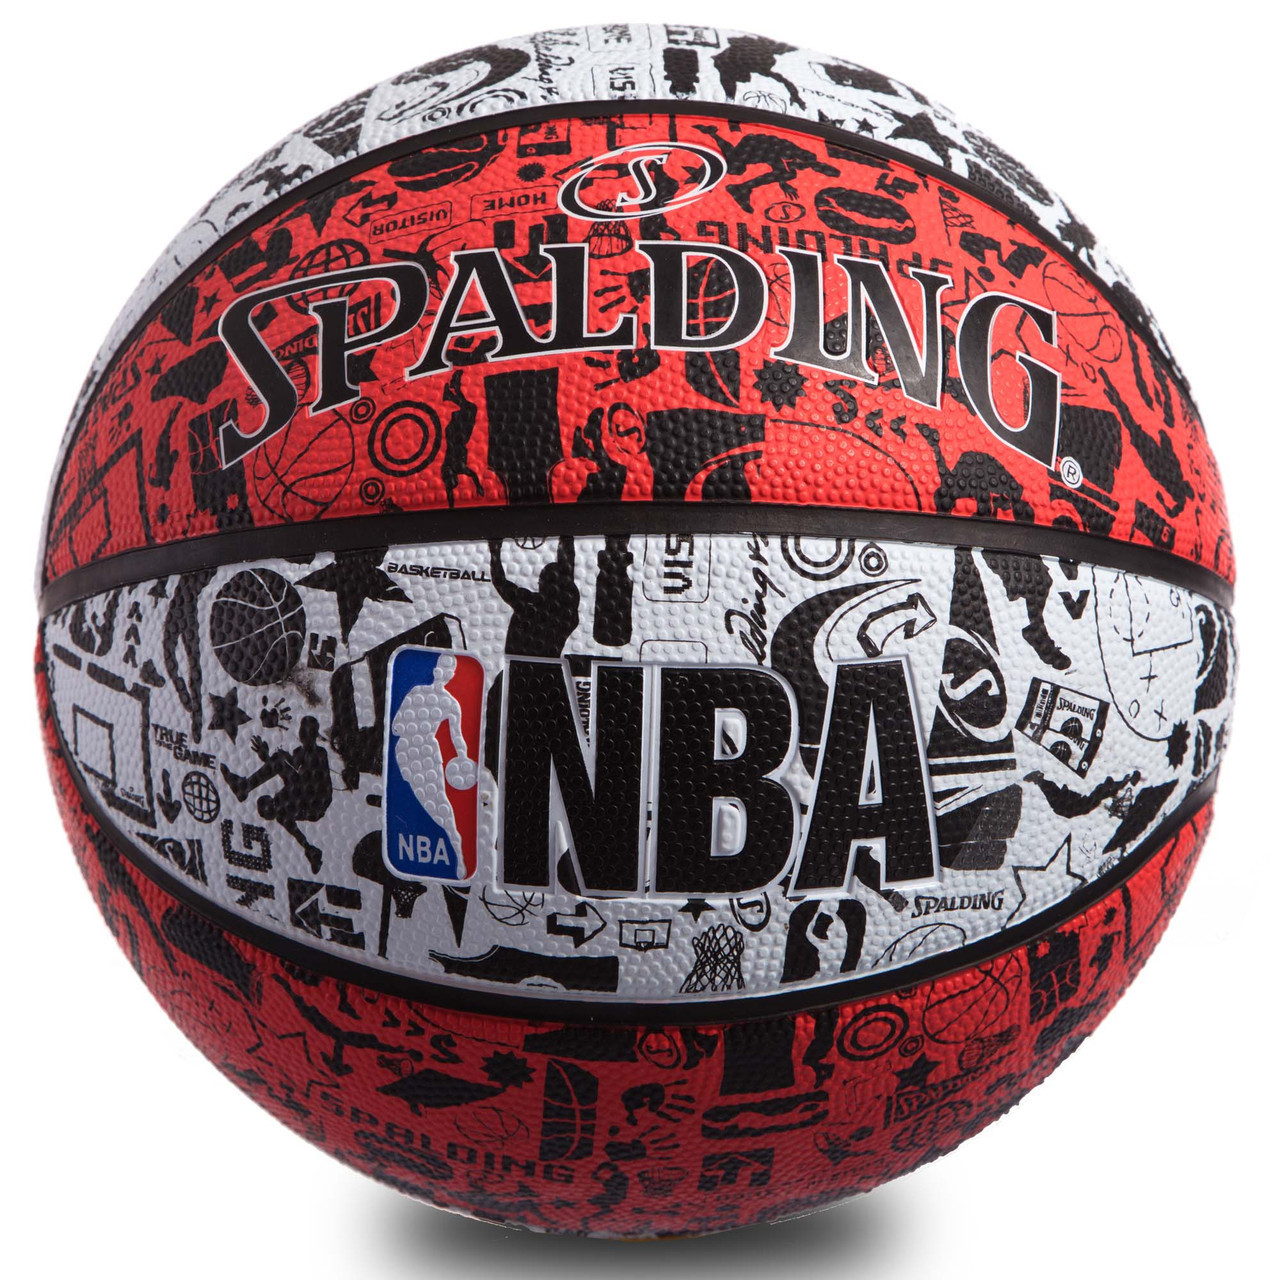 М'яч баскетбольний гумовий №7 SPALDIN 83574Z NBA GRAFFITI